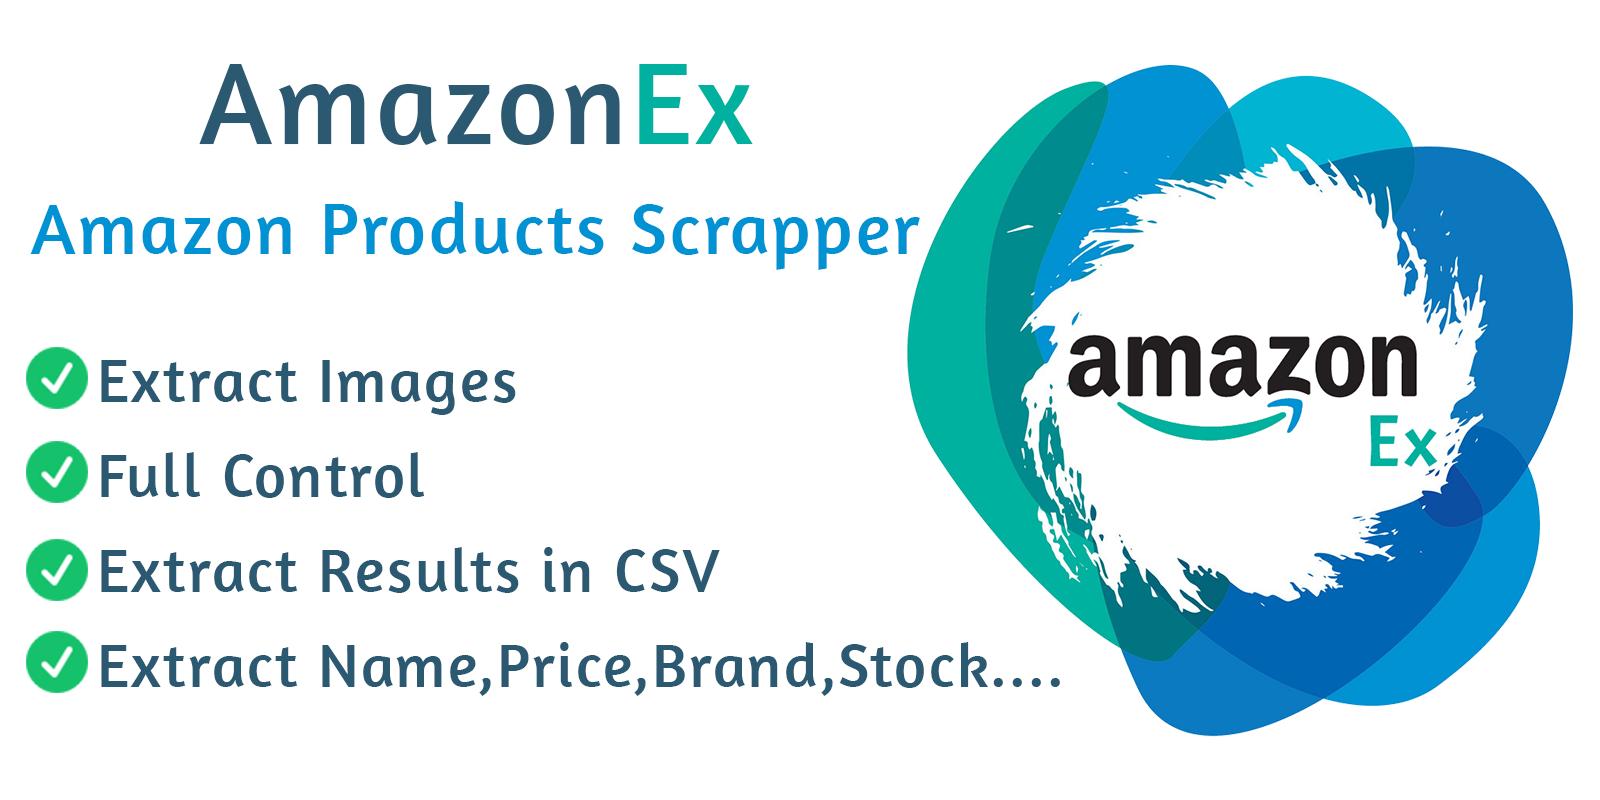 AmazonEx Amazon Products Scrapper